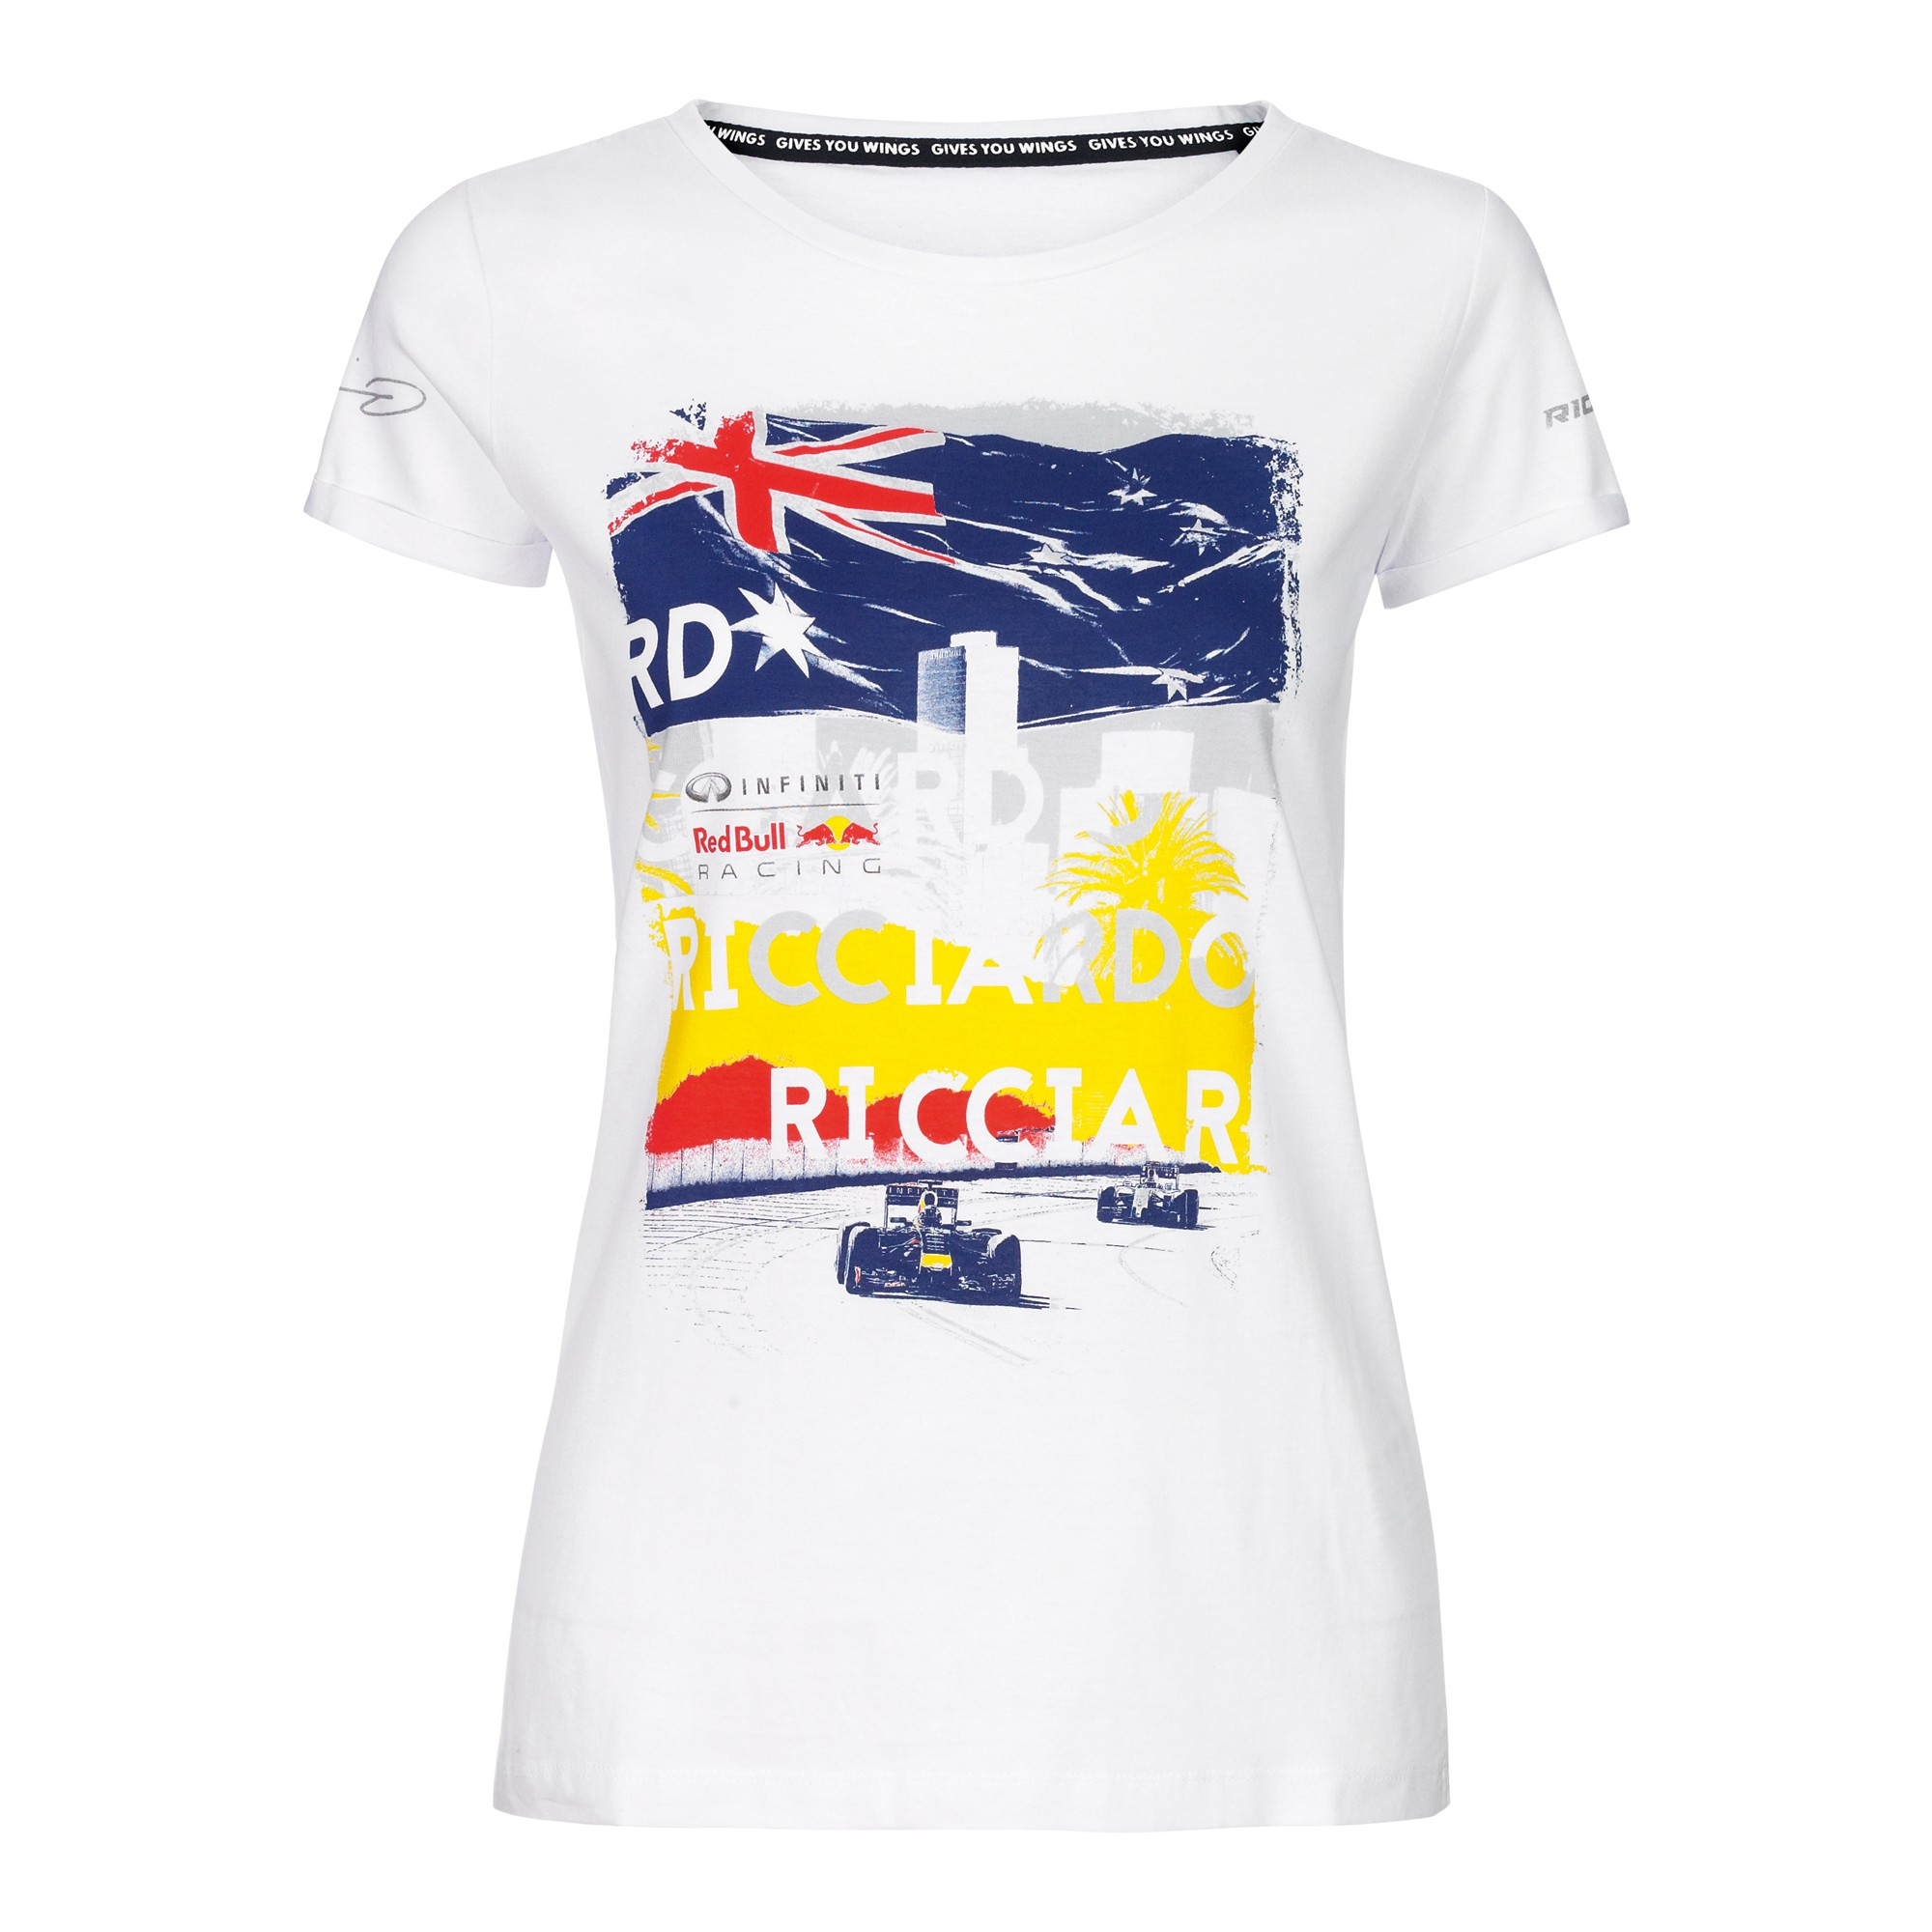 Daniel Ricciardo Driver T-Shirt